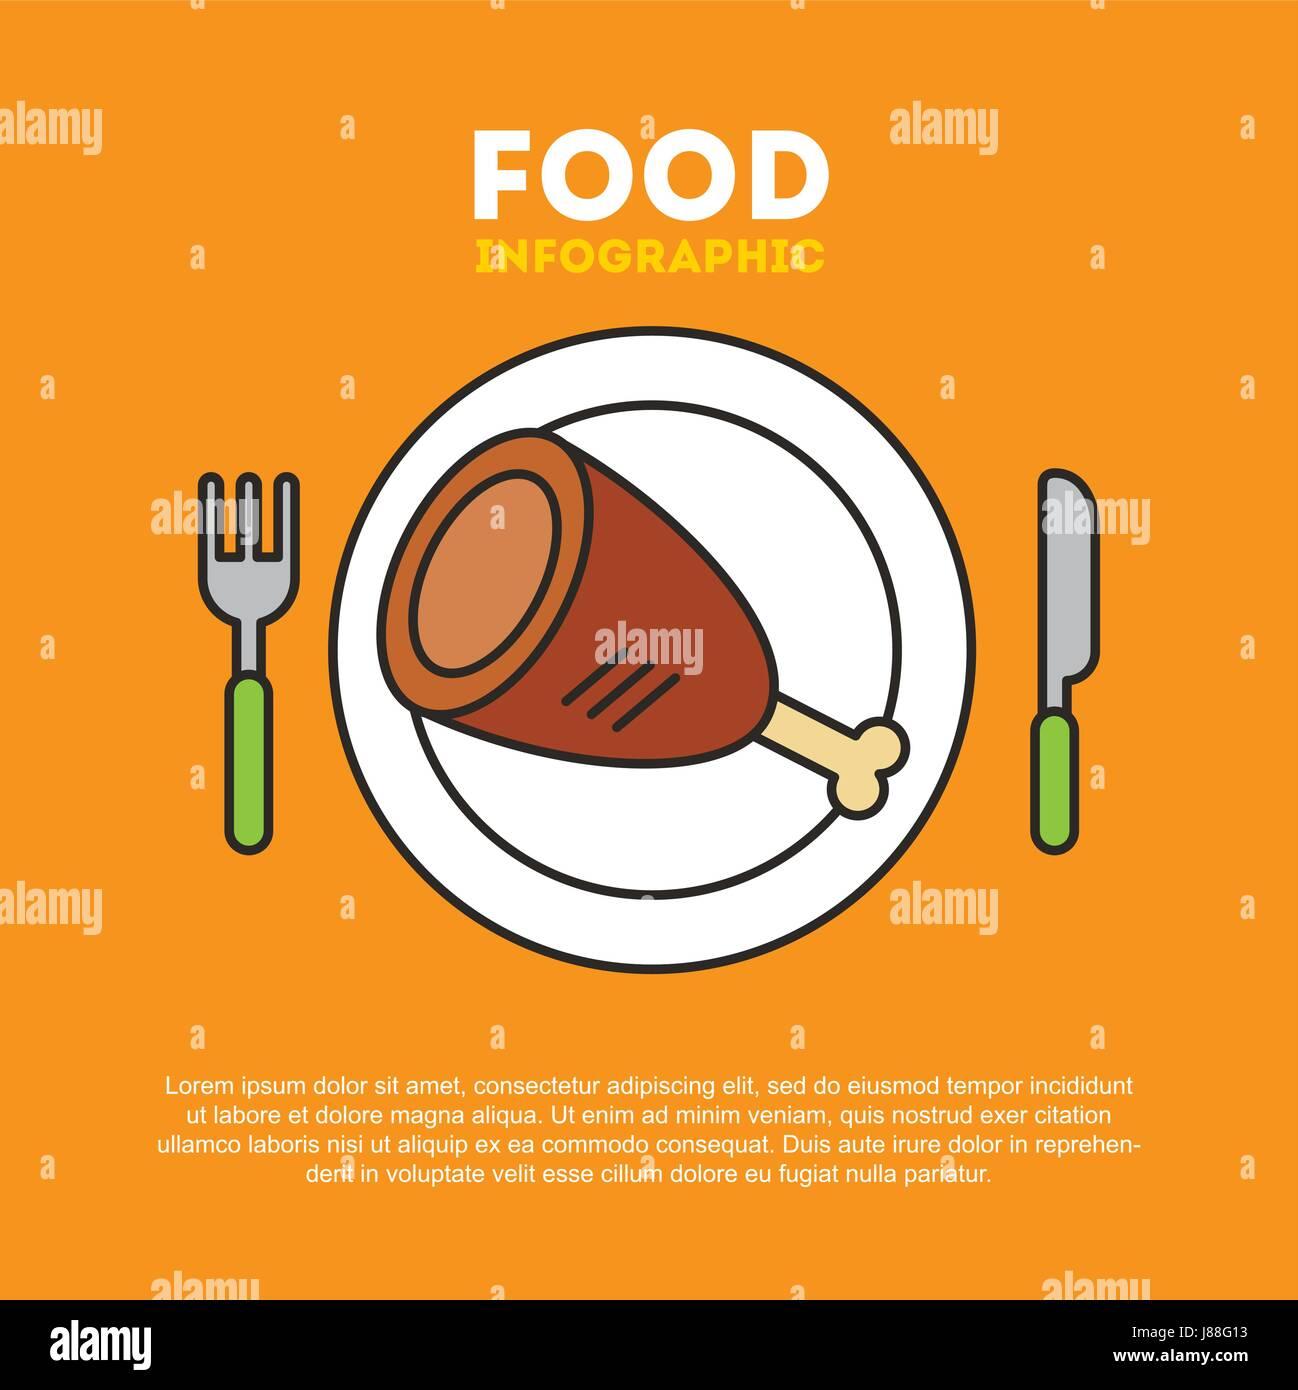 protein food illustration - Stock Image